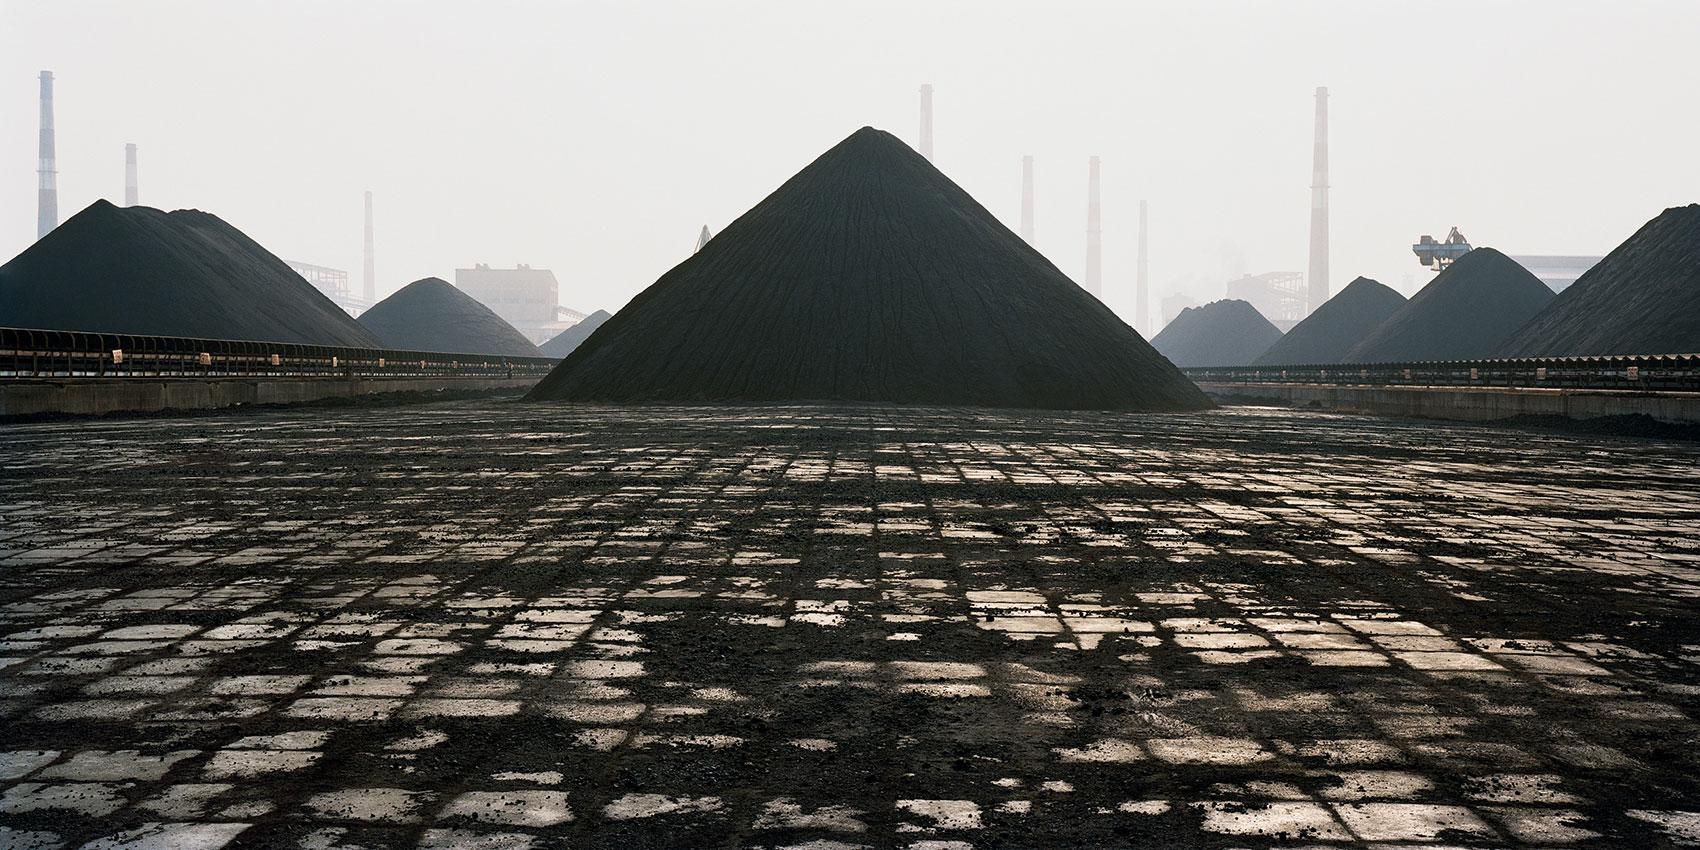 pyramids of coal